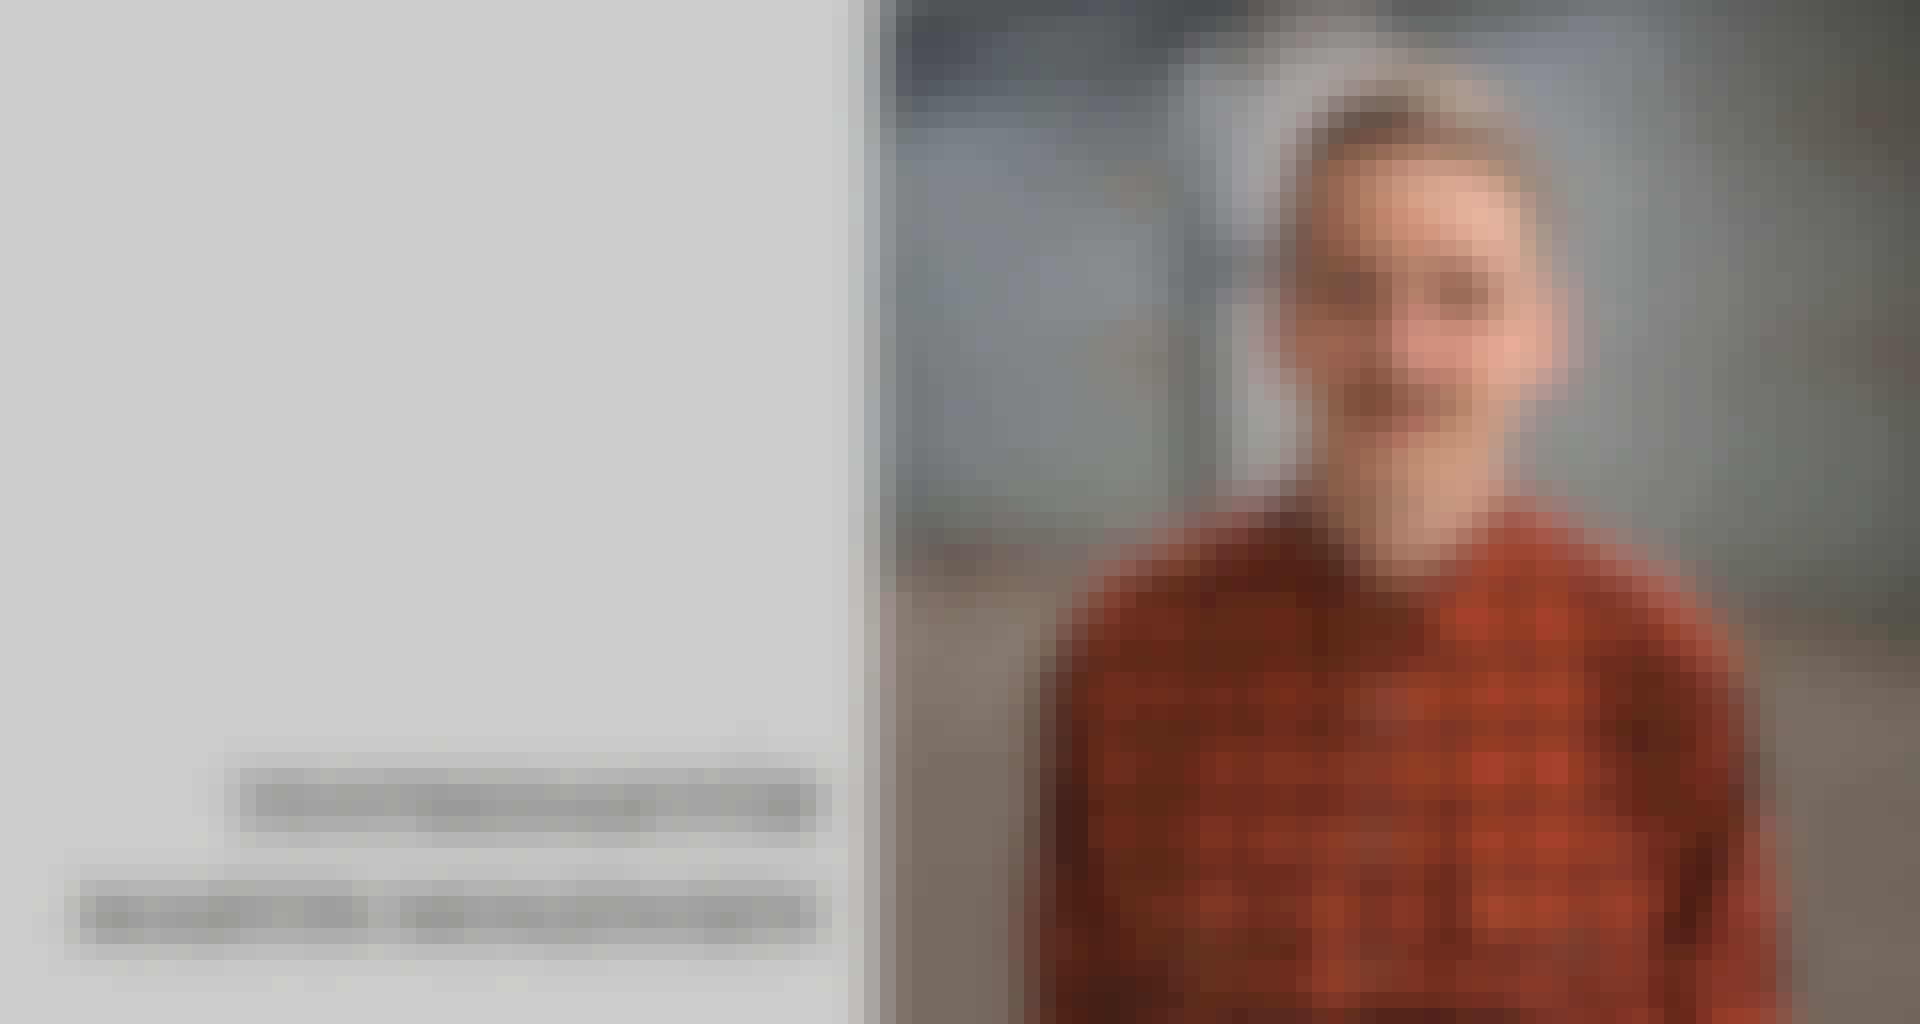 Testredaktör Martin Mogensen